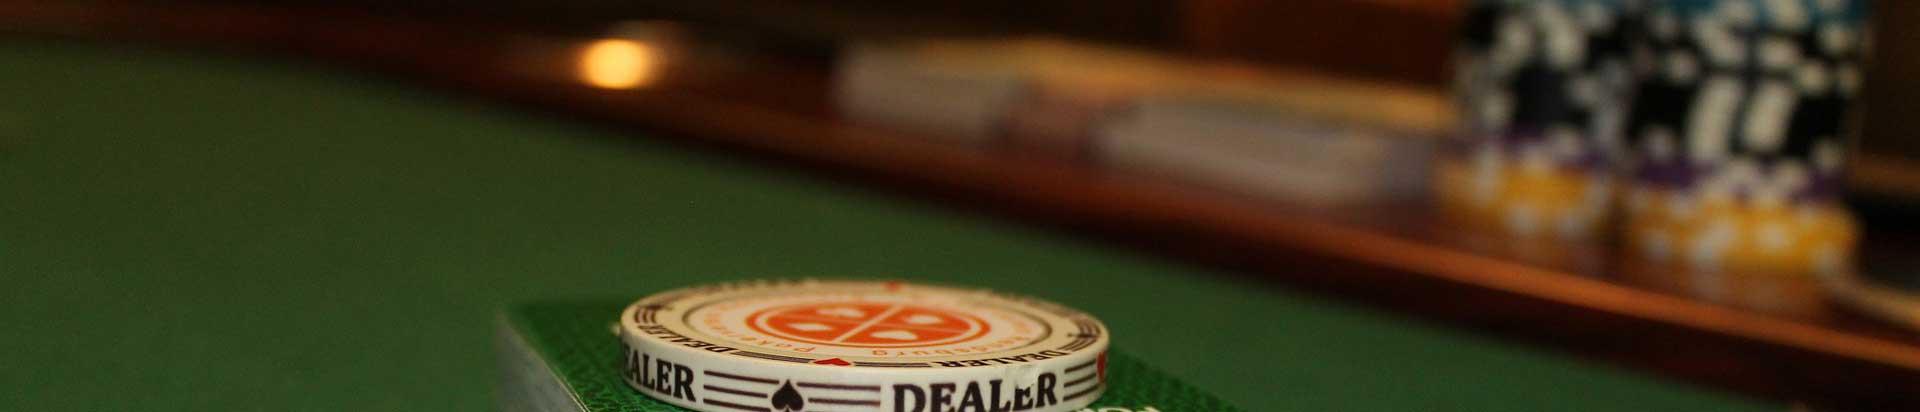 Casinoundpoker.ch